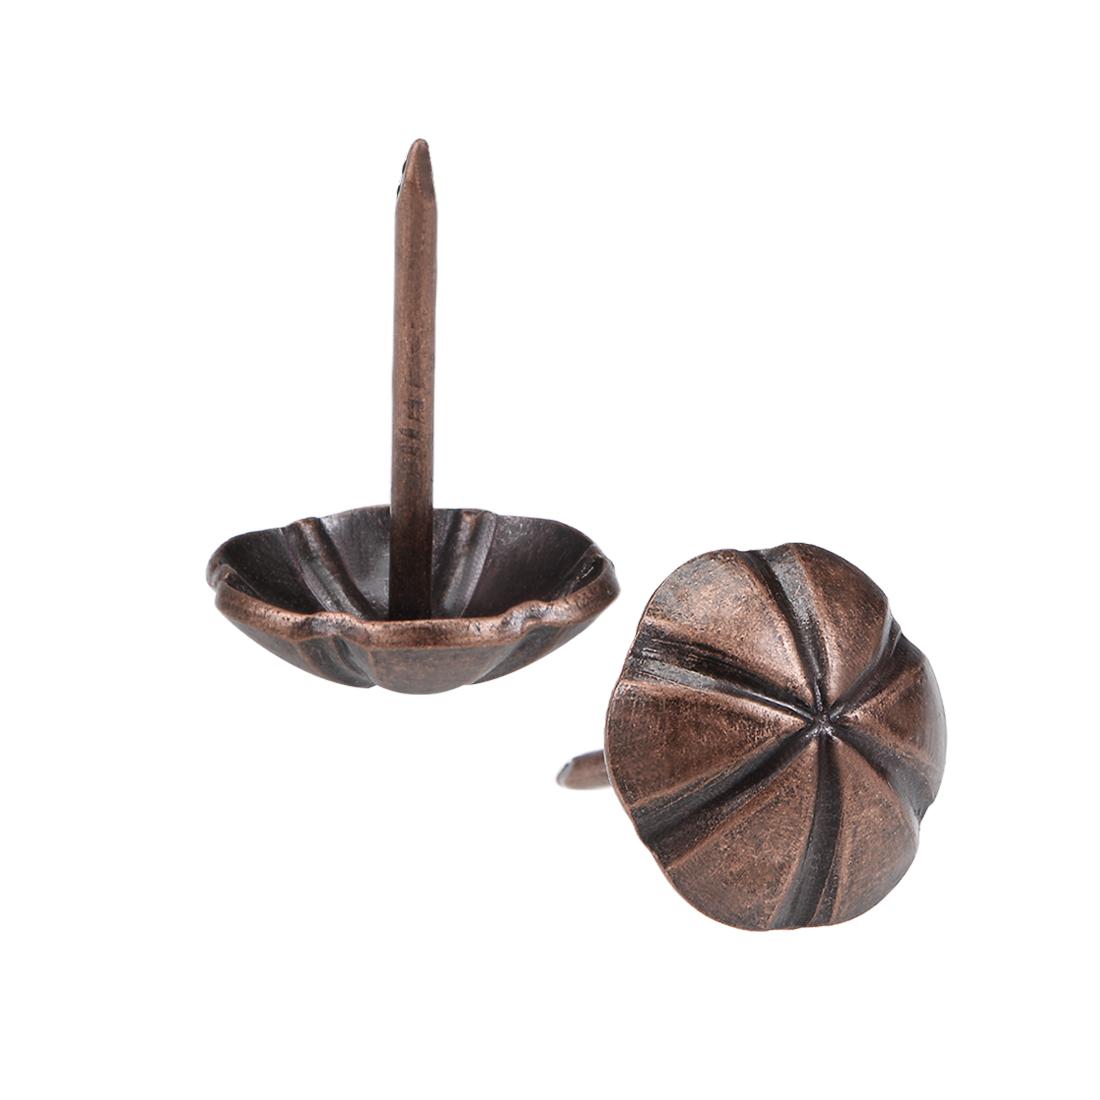 Upholstery Nails Tacks 16mm Head Dia Round Thumb Push Pins Copper Tone 35 Pcs